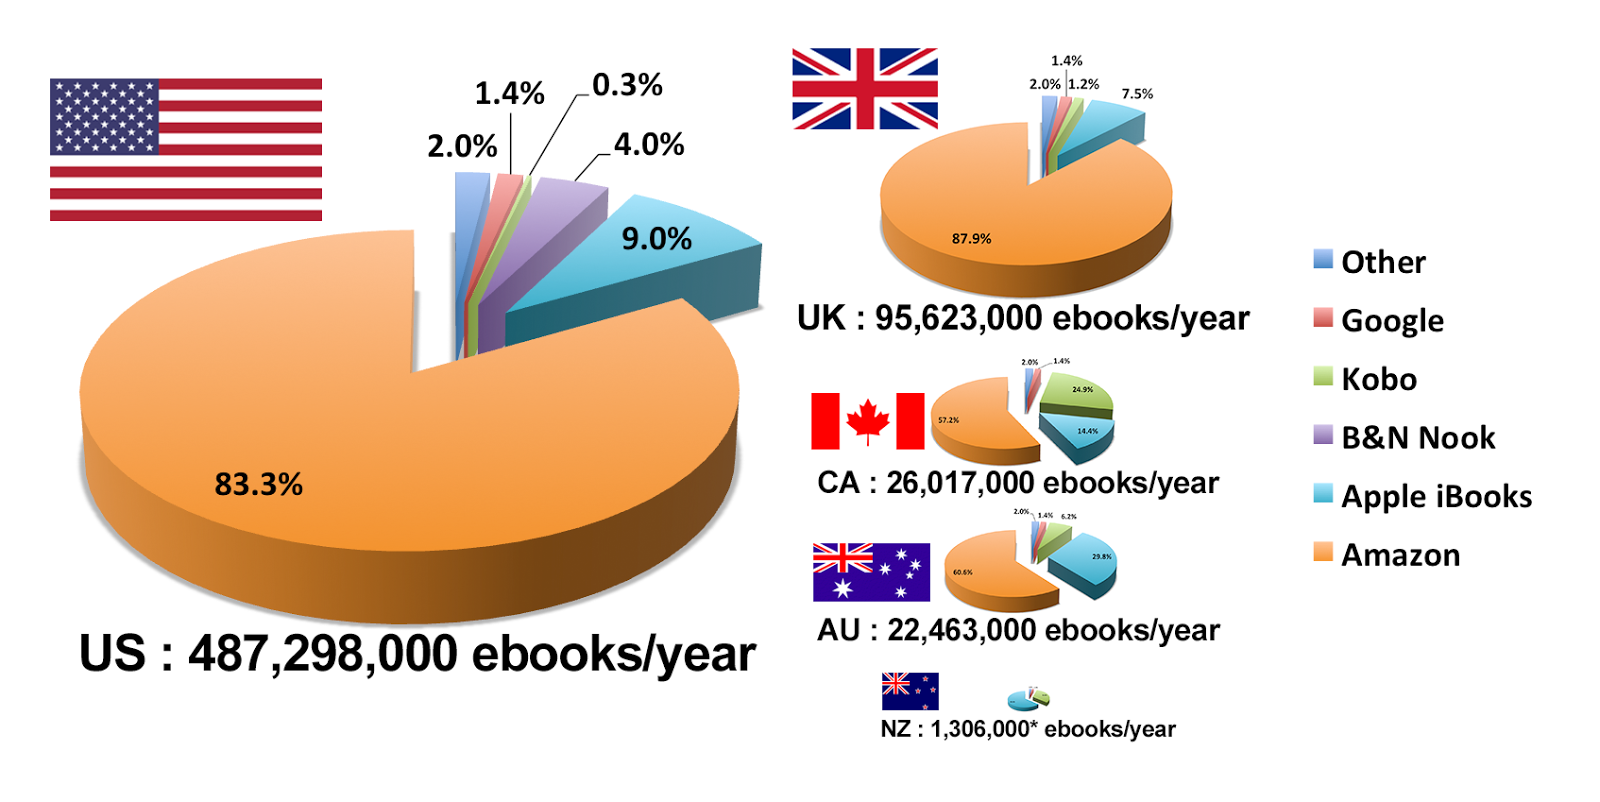 Amazon Kindle Marketshare Versus Other Platforms Graph